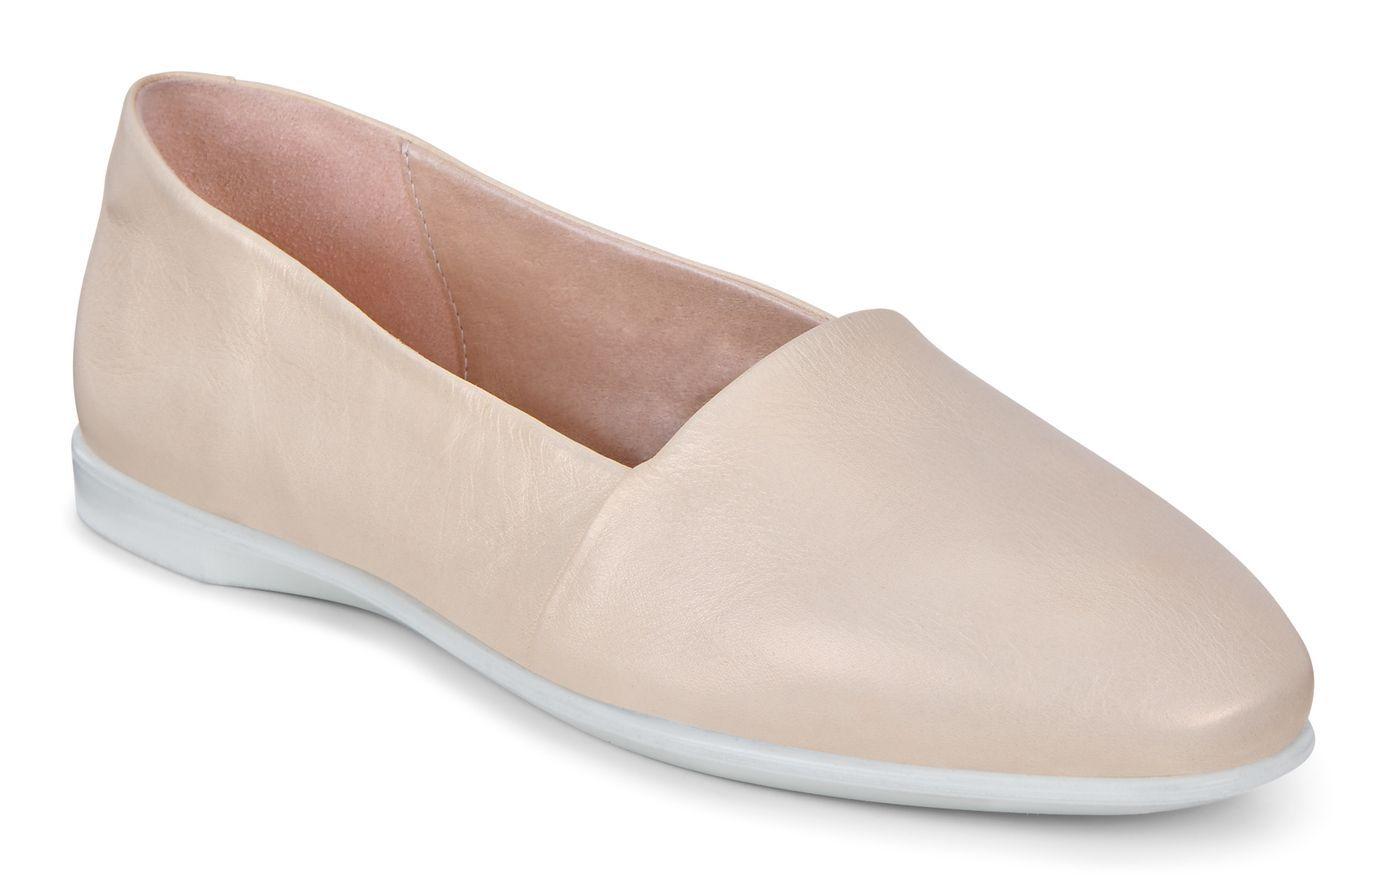 ecco women's leisure slip on loafer flat